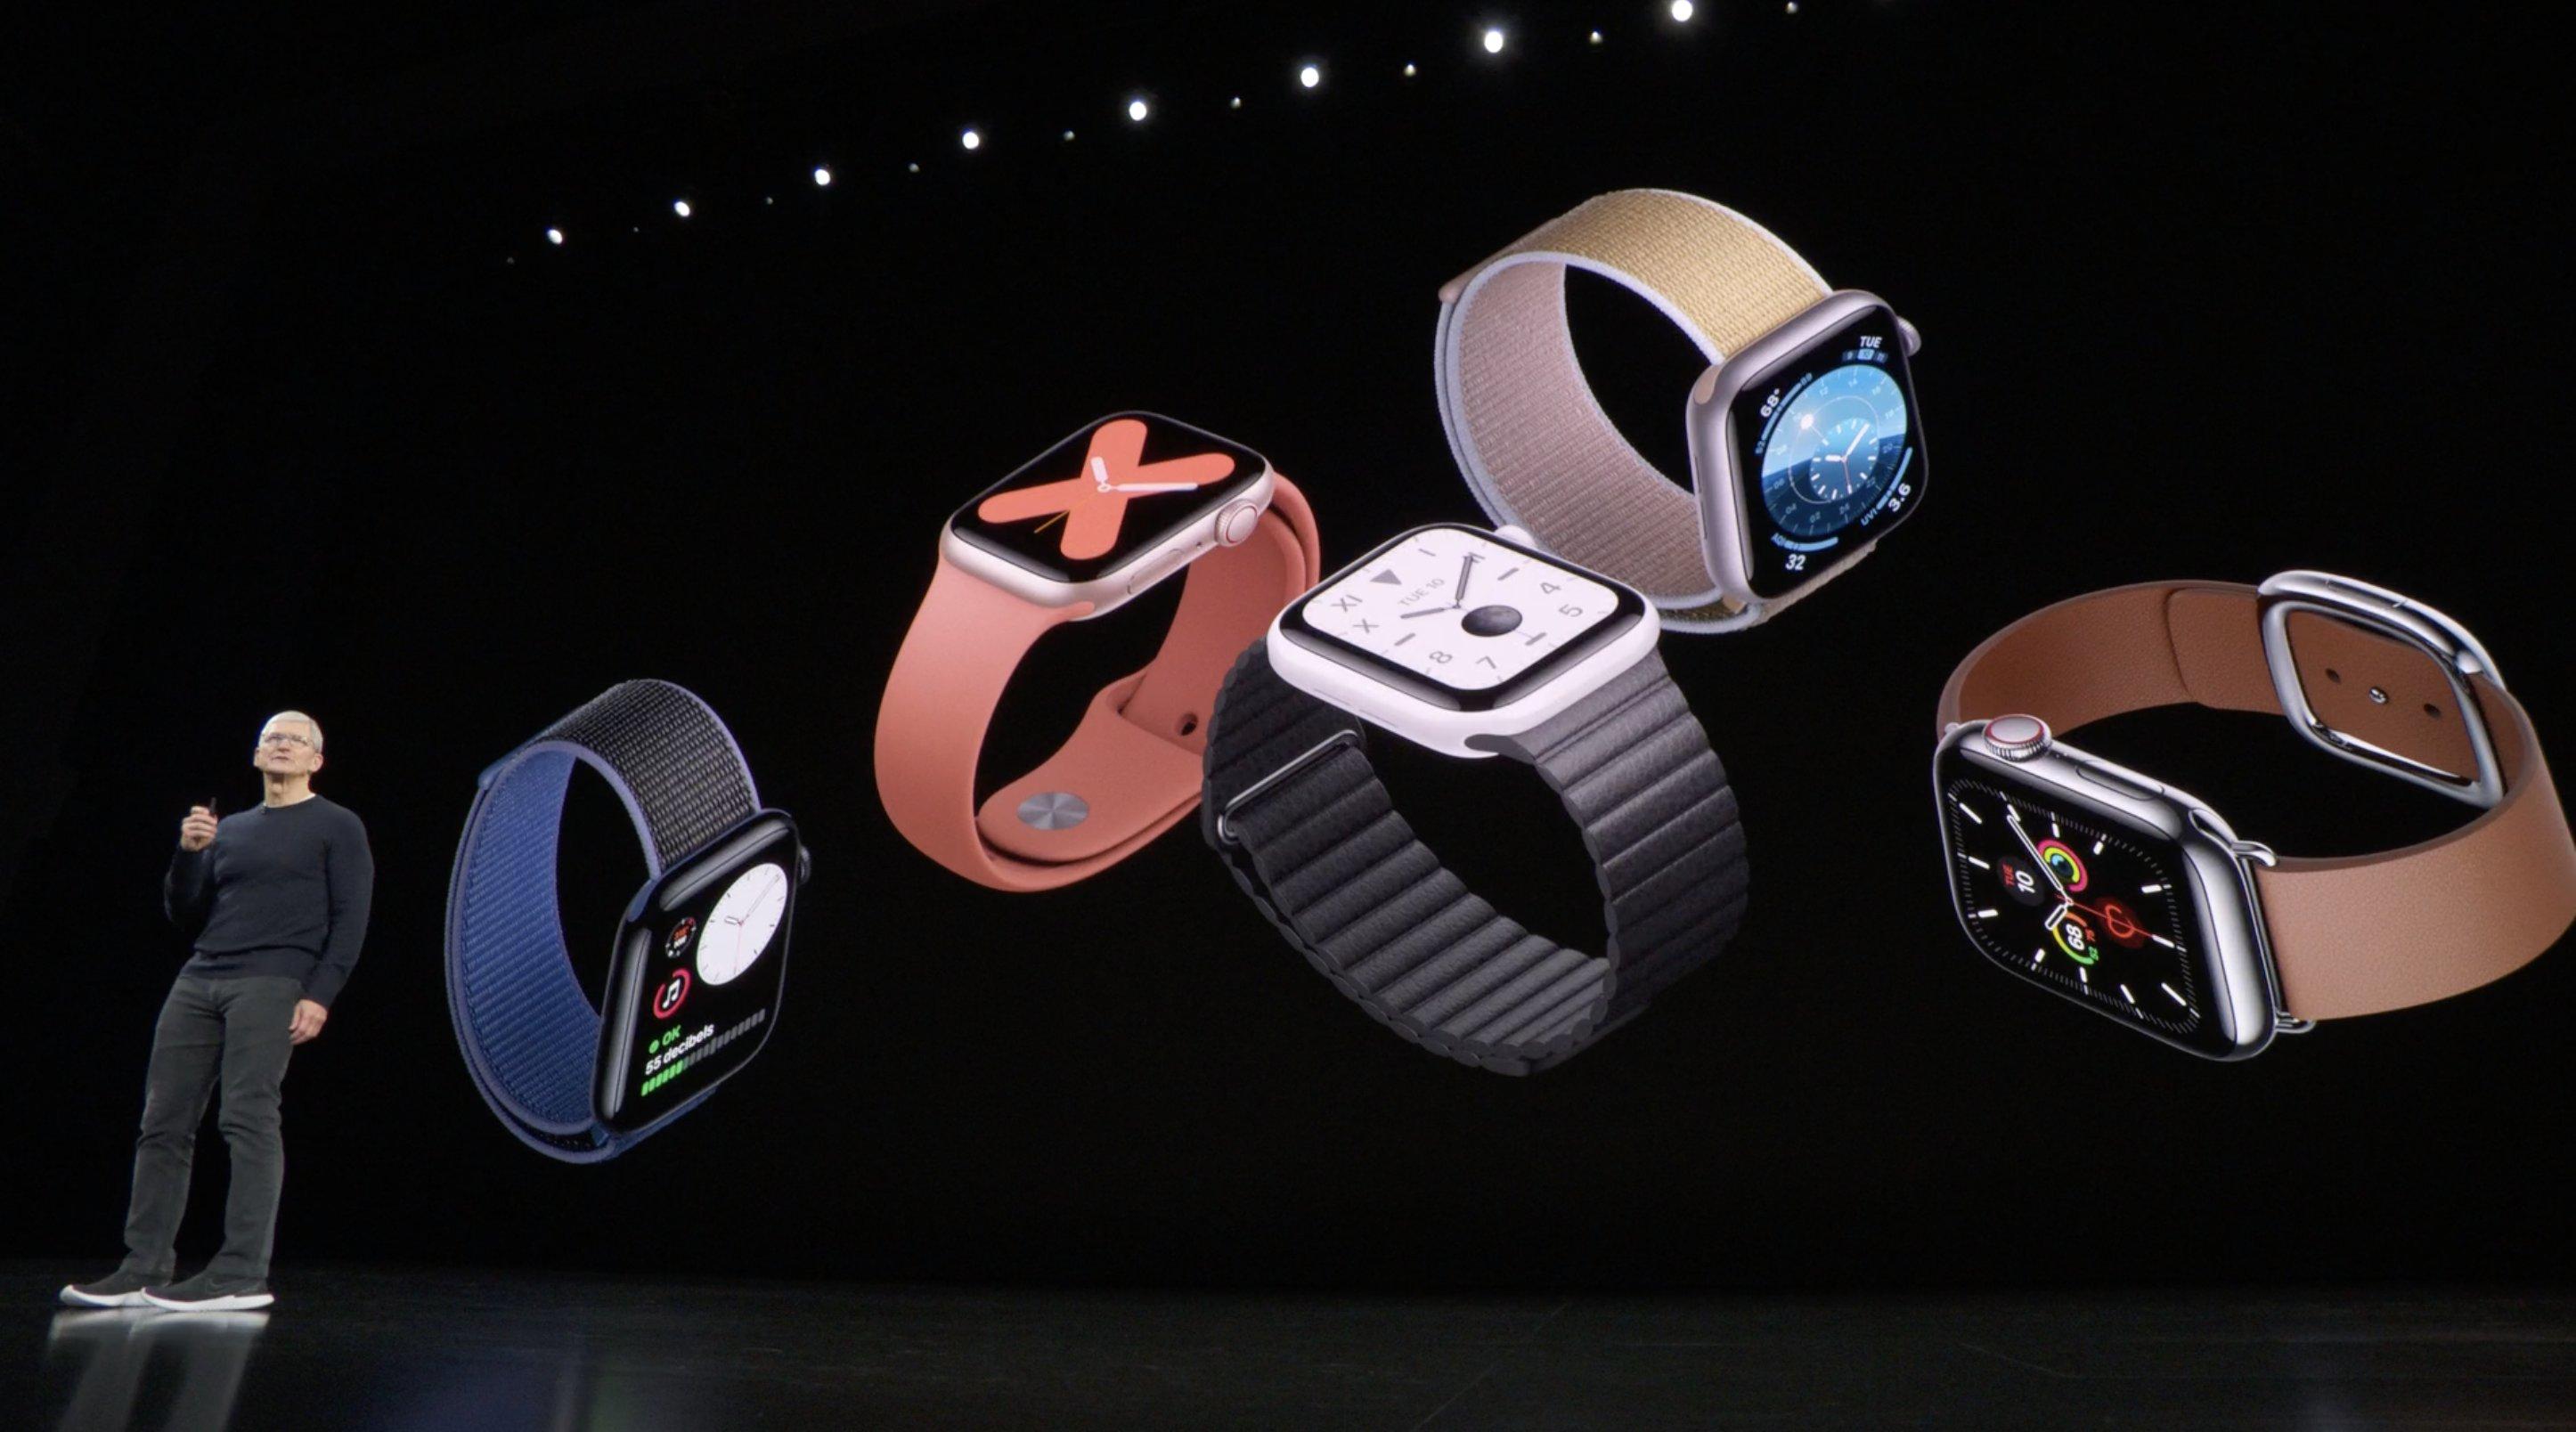 Keynote Septiembre 2019: Apple Watch series 5 y Tim Cook